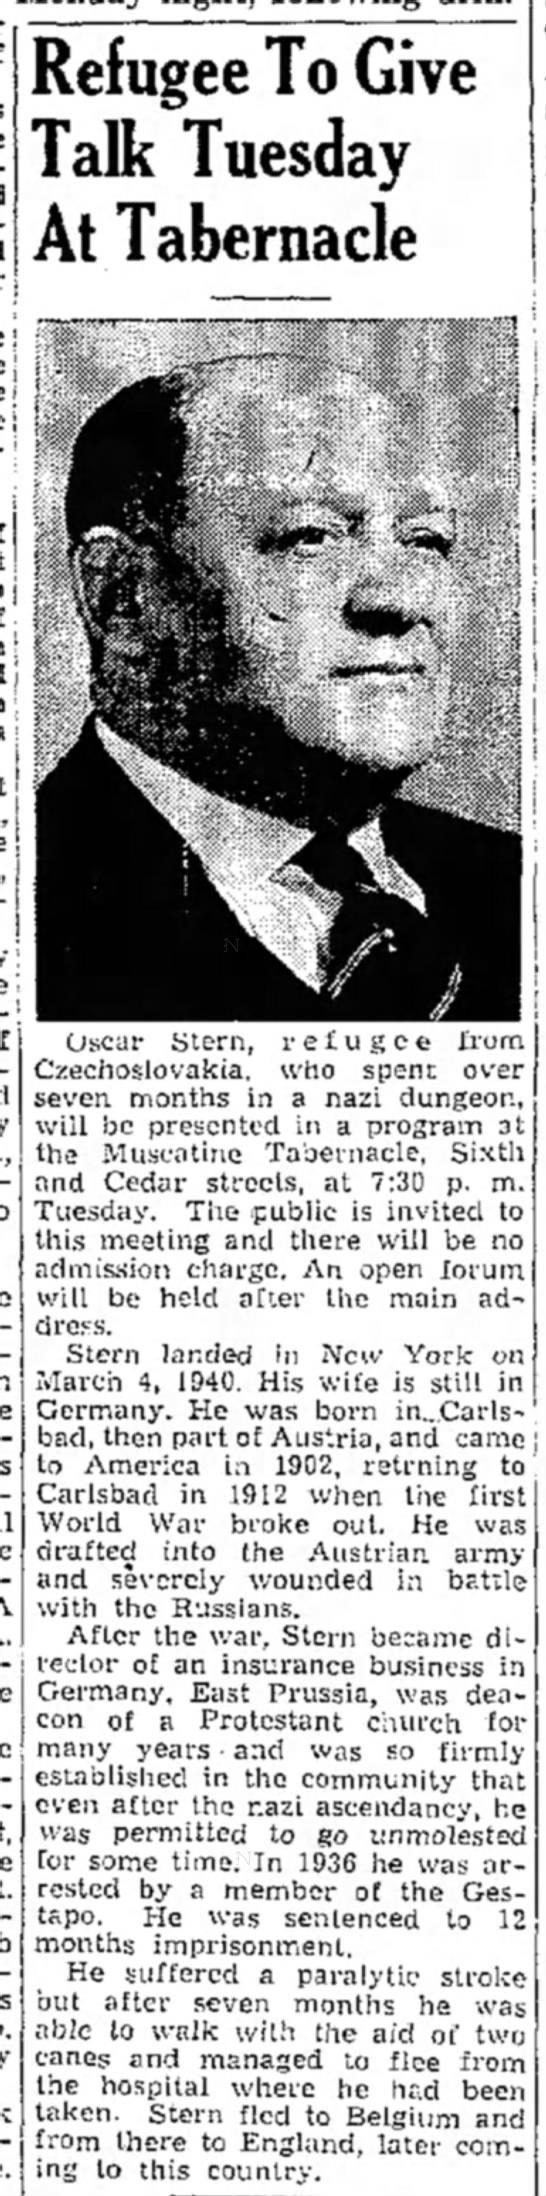 The Muscatine (IA) News-Tribune, 07 Apr 1945, page 8 column 2 - i £; j \s ':,f: ; Refugee To Give Talk Tuesday...